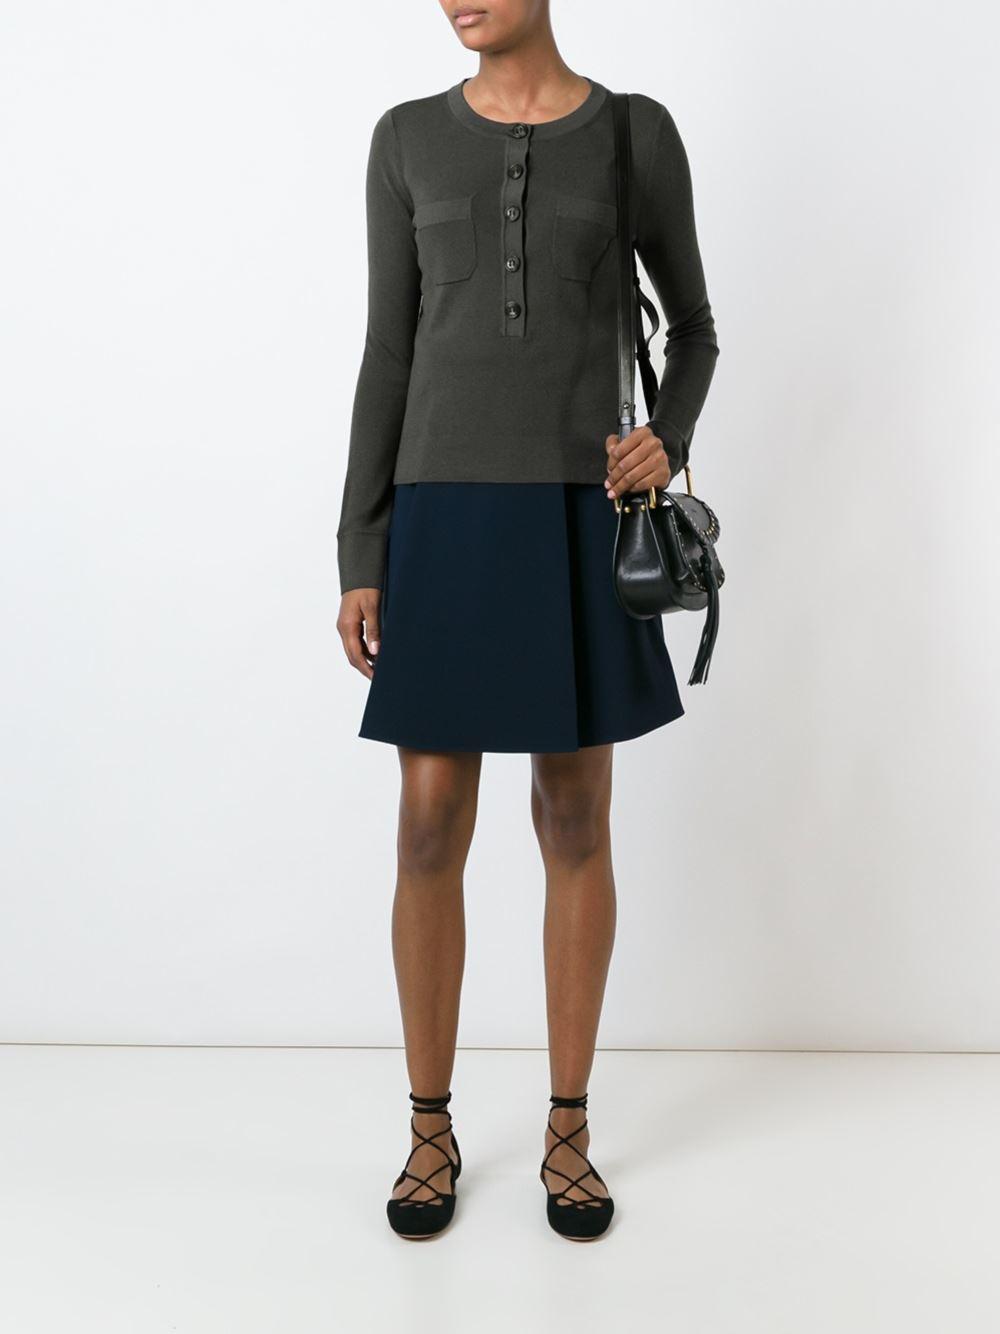 lyst dorothee schumacher three quarter button neck sweater in green. Black Bedroom Furniture Sets. Home Design Ideas